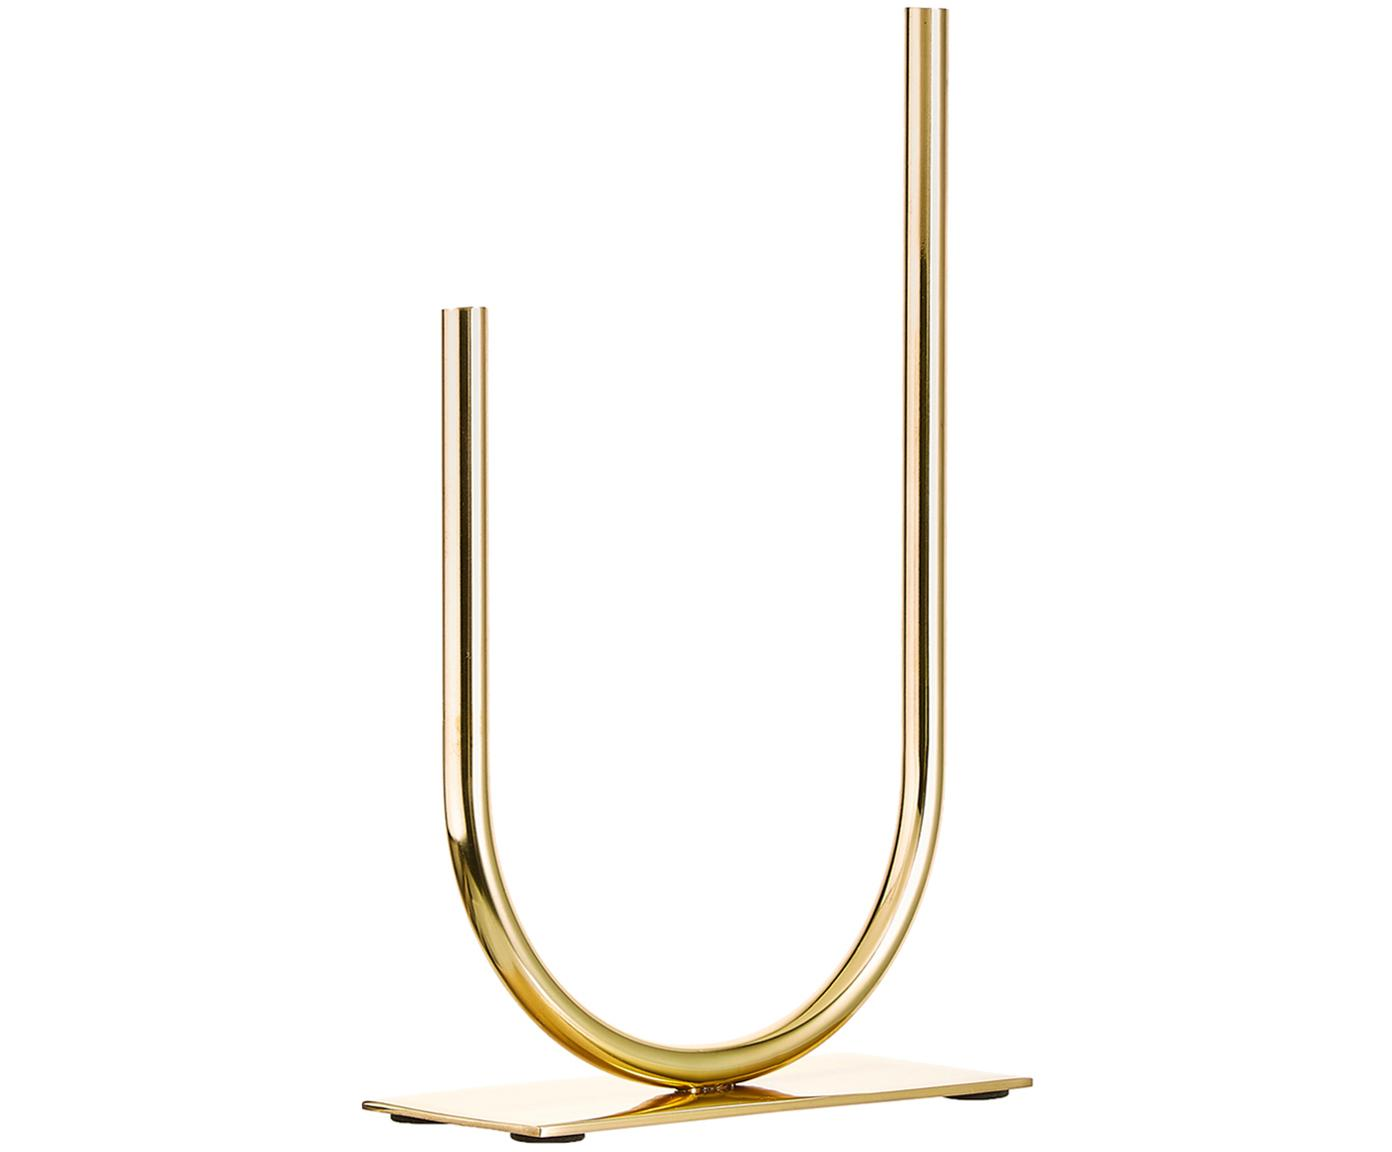 Vaso in metallo in metallo Circle U, Metallo, Dorato, Larg. 19 x Alt. 30 cm